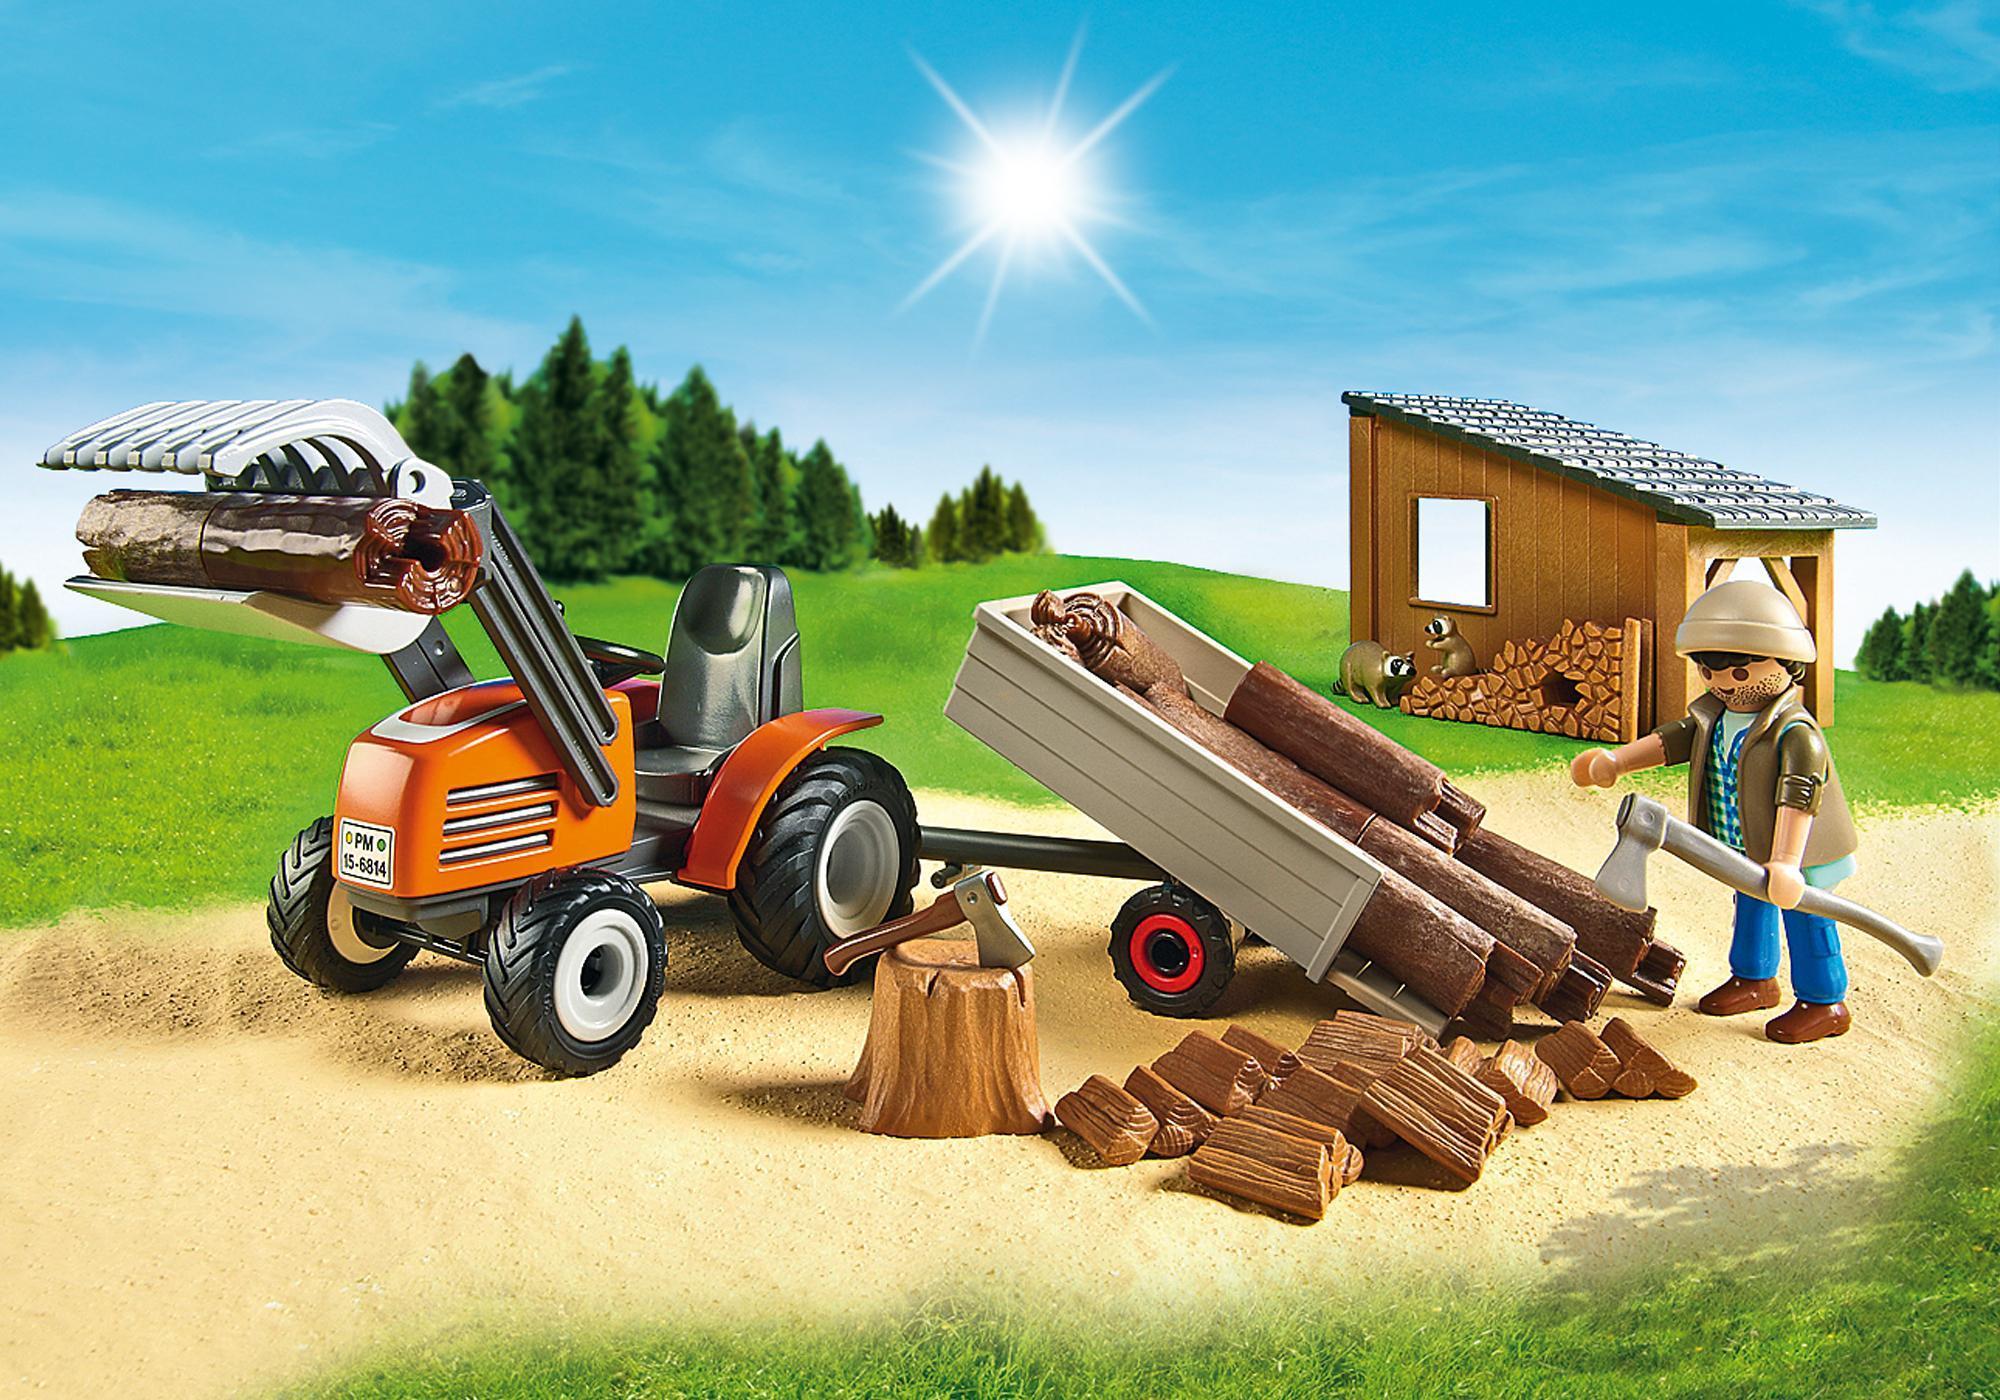 http://media.playmobil.com/i/playmobil/6814_product_extra1